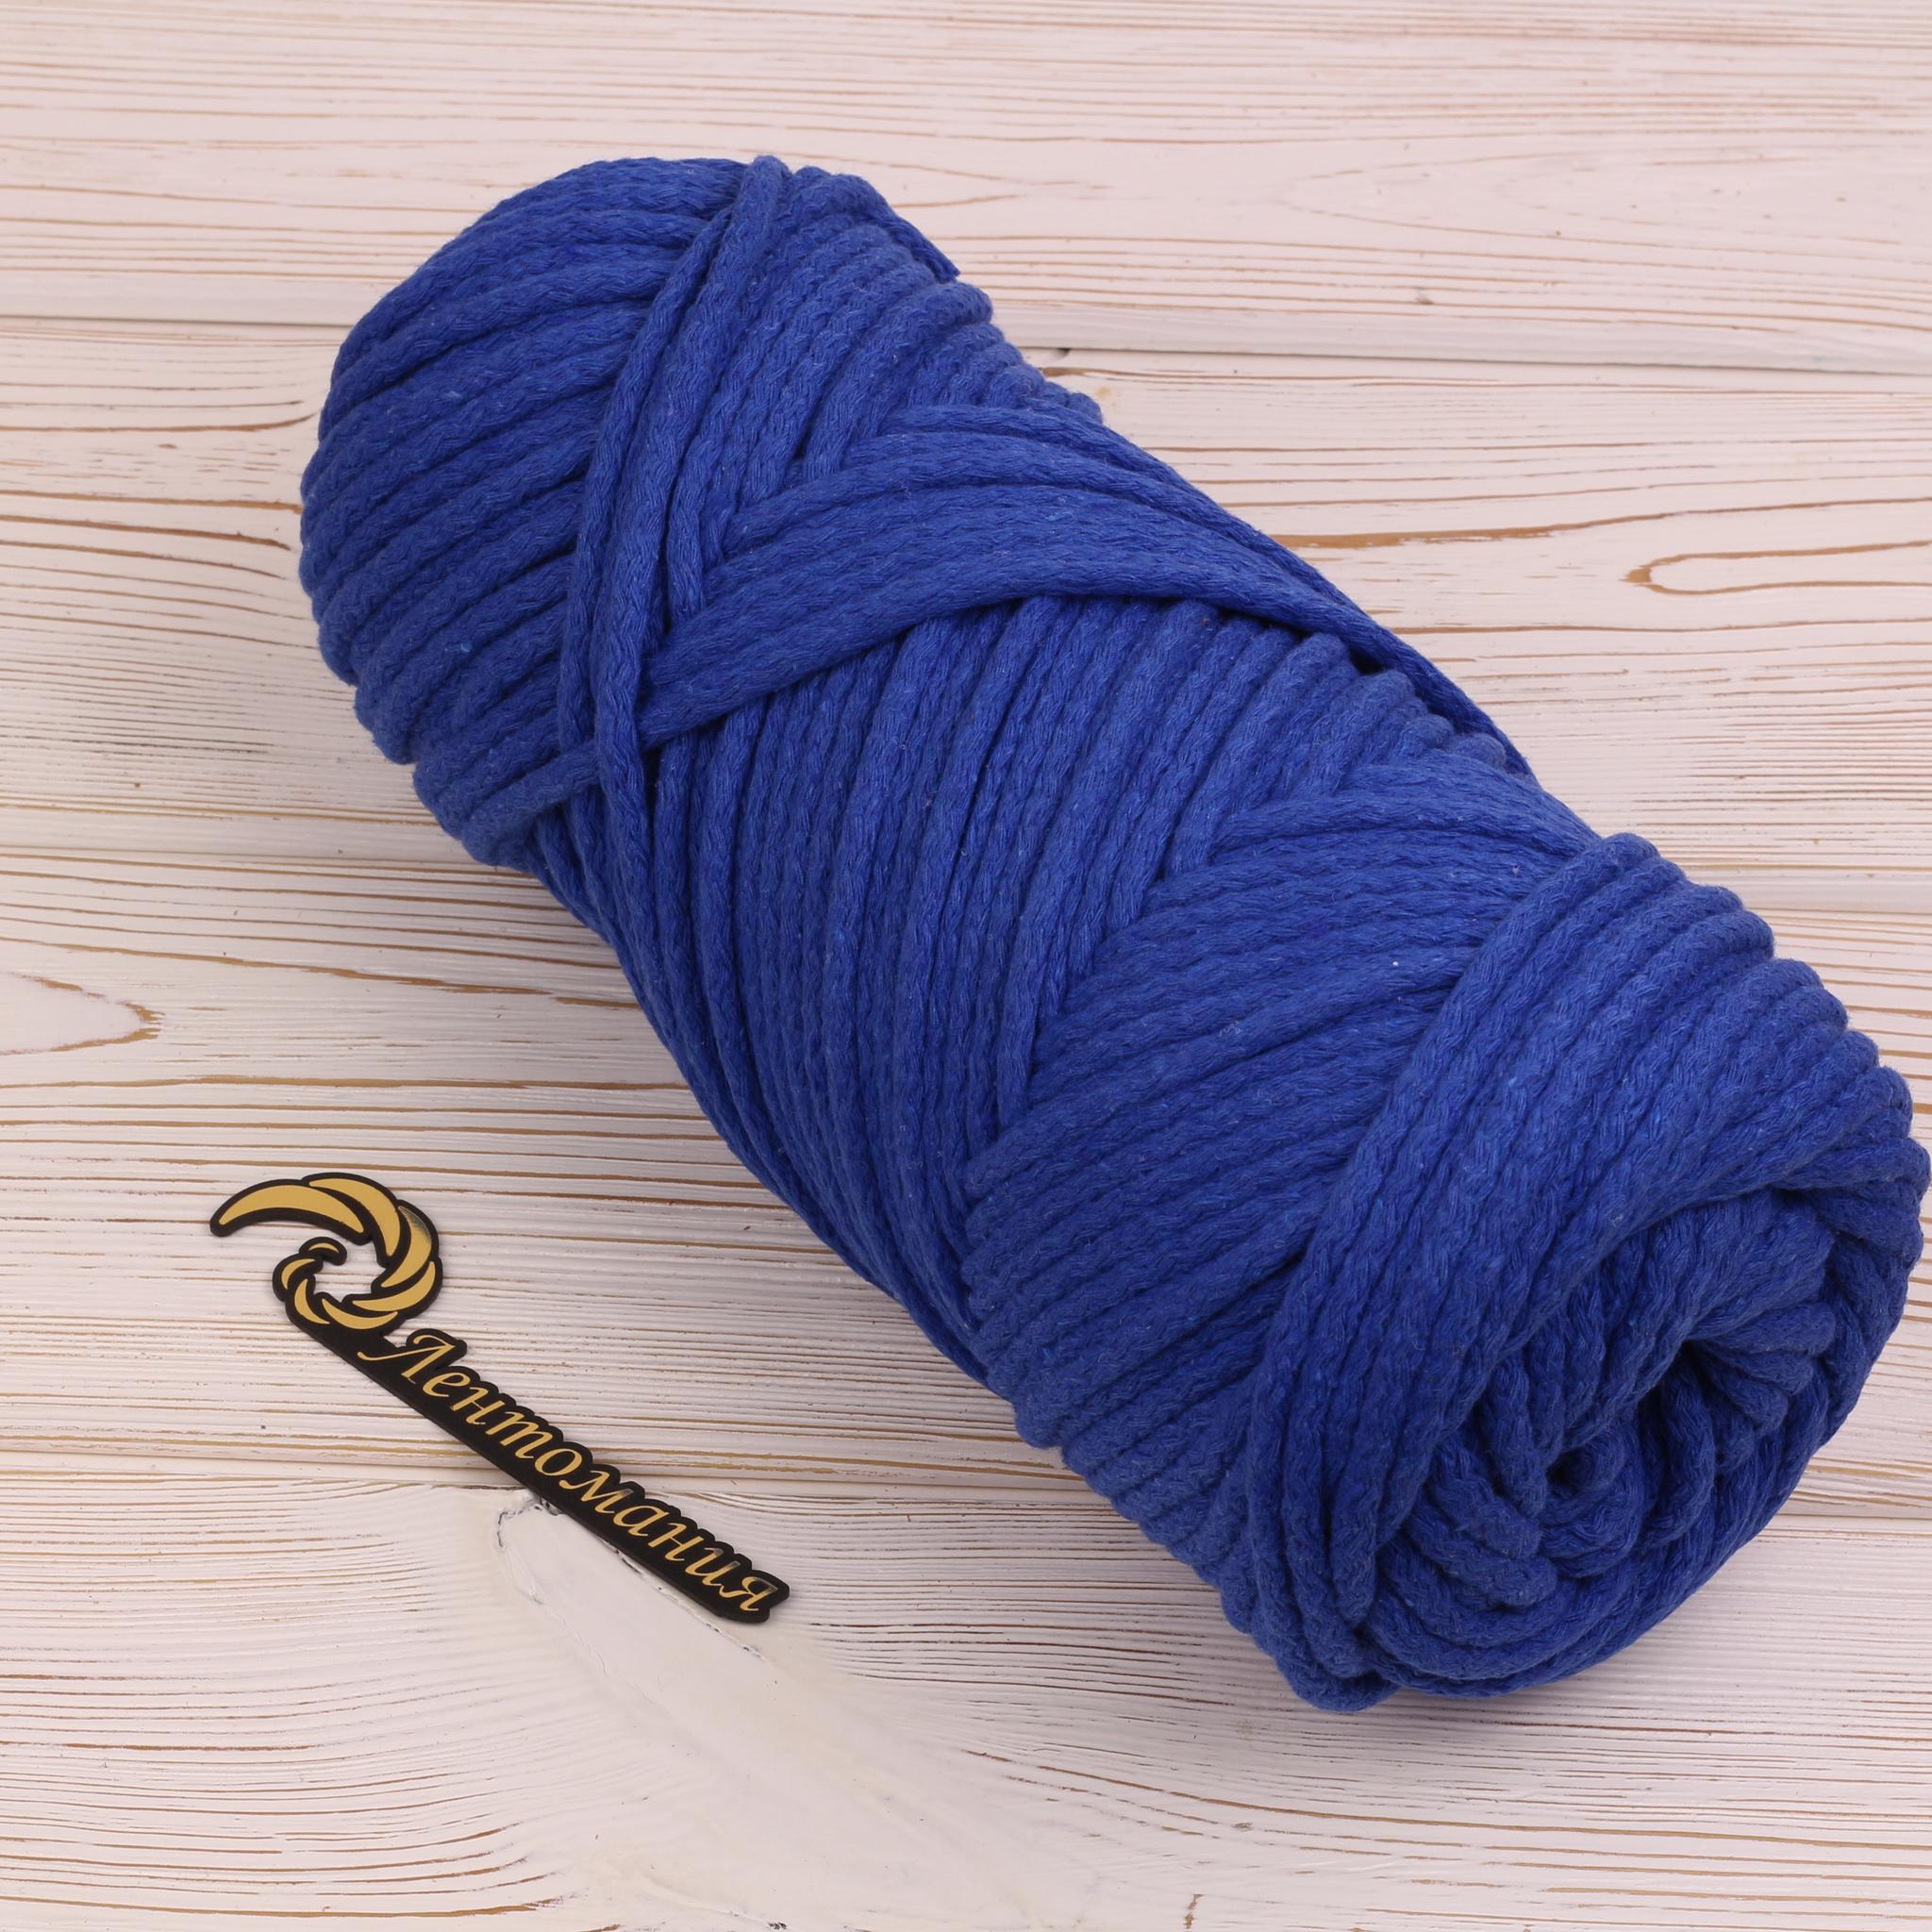 5мм Шнур 5мм Синий IMG_4211.JPG